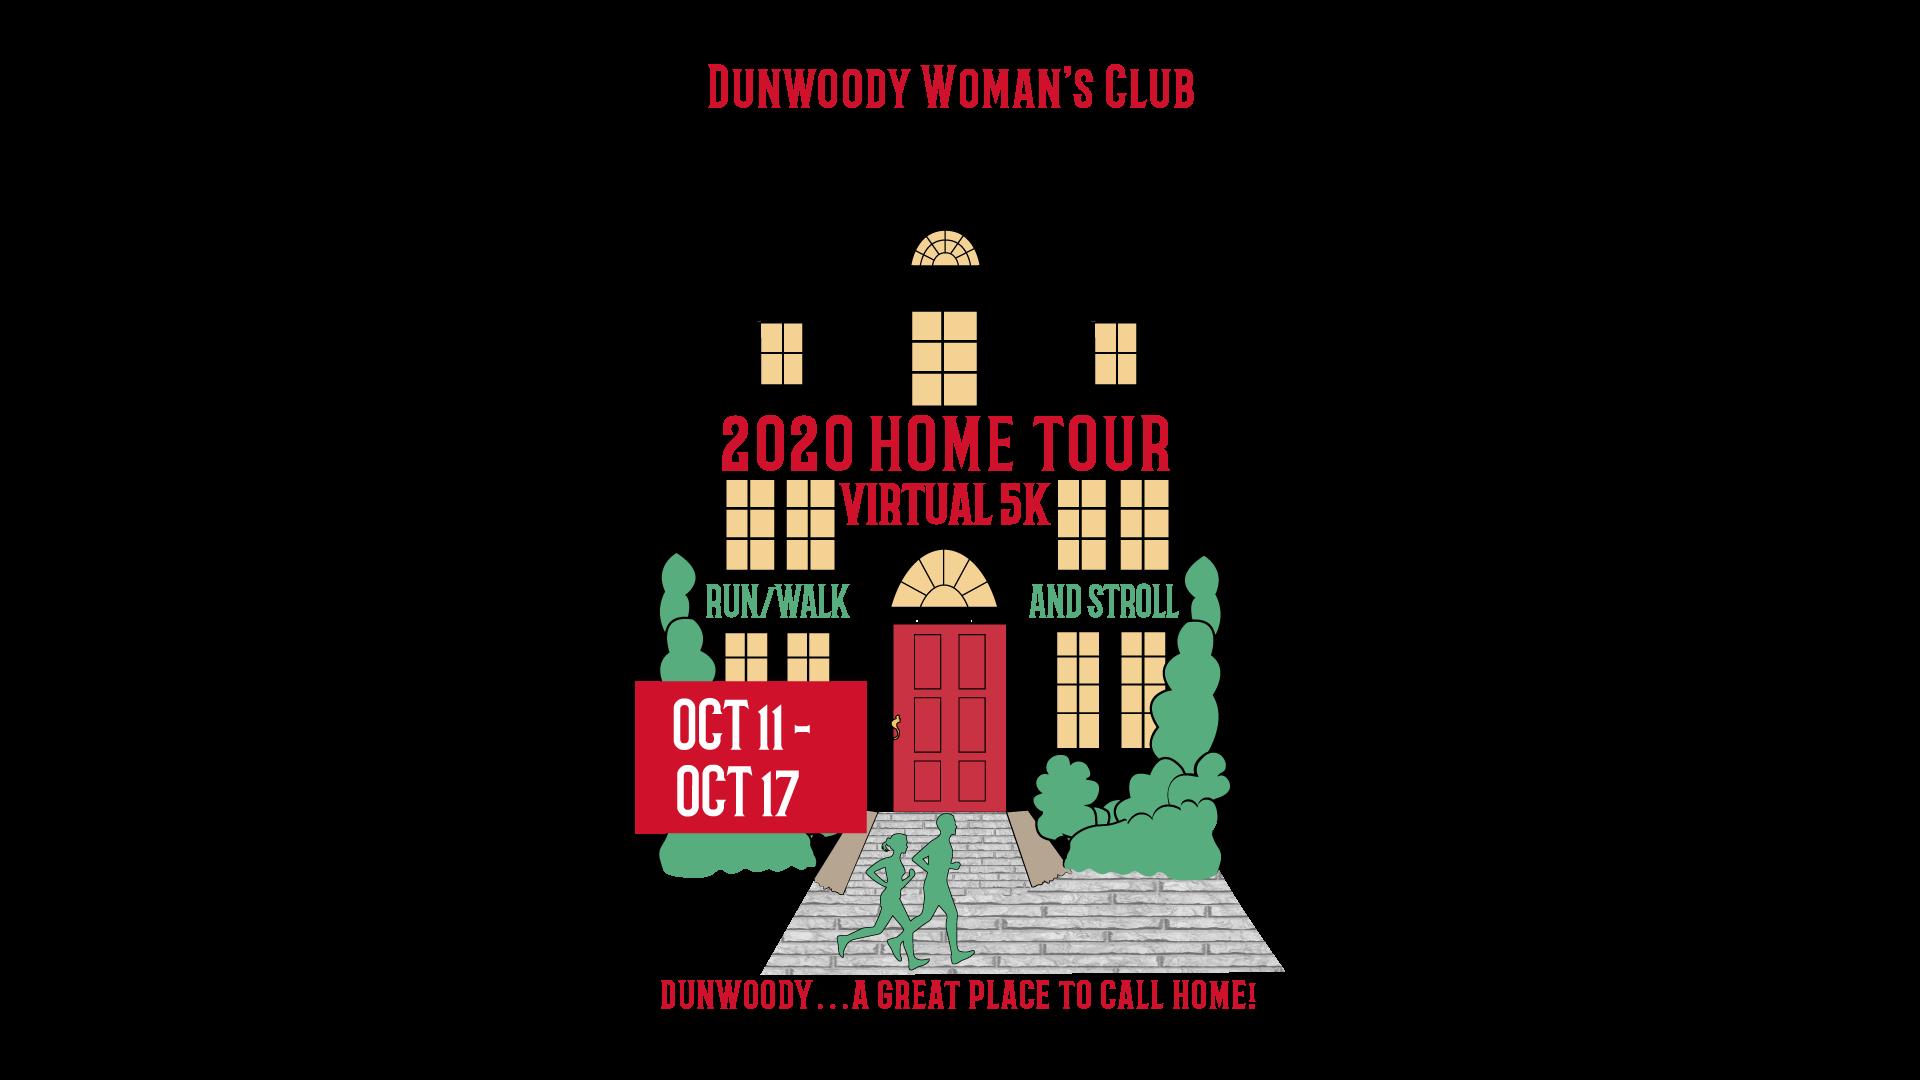 Dunwoody Woman's Club 2020 Home Tour Virtual 5KRun/Walk and Stroll